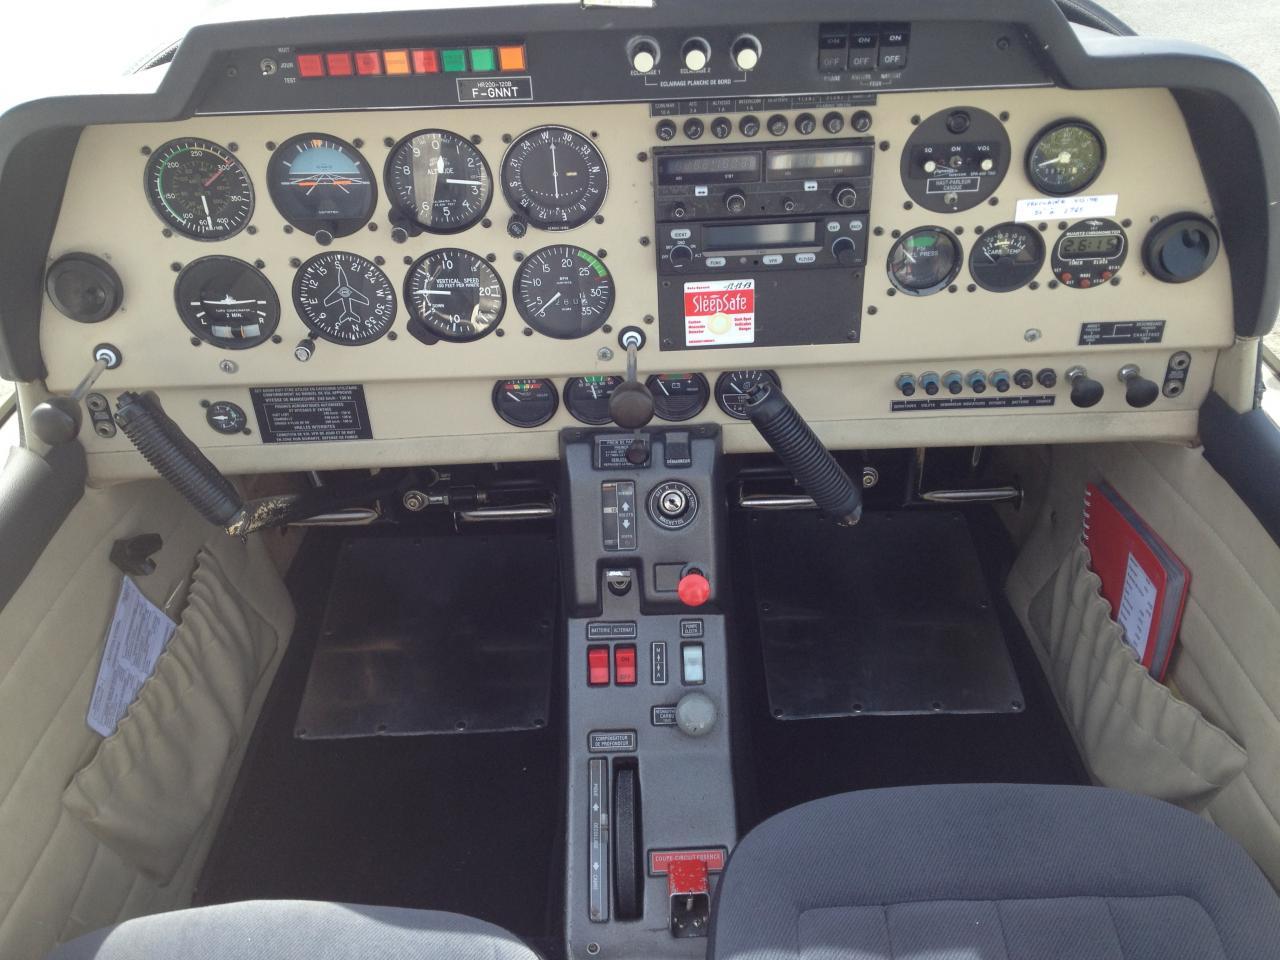 HR200 - Tableau de bord